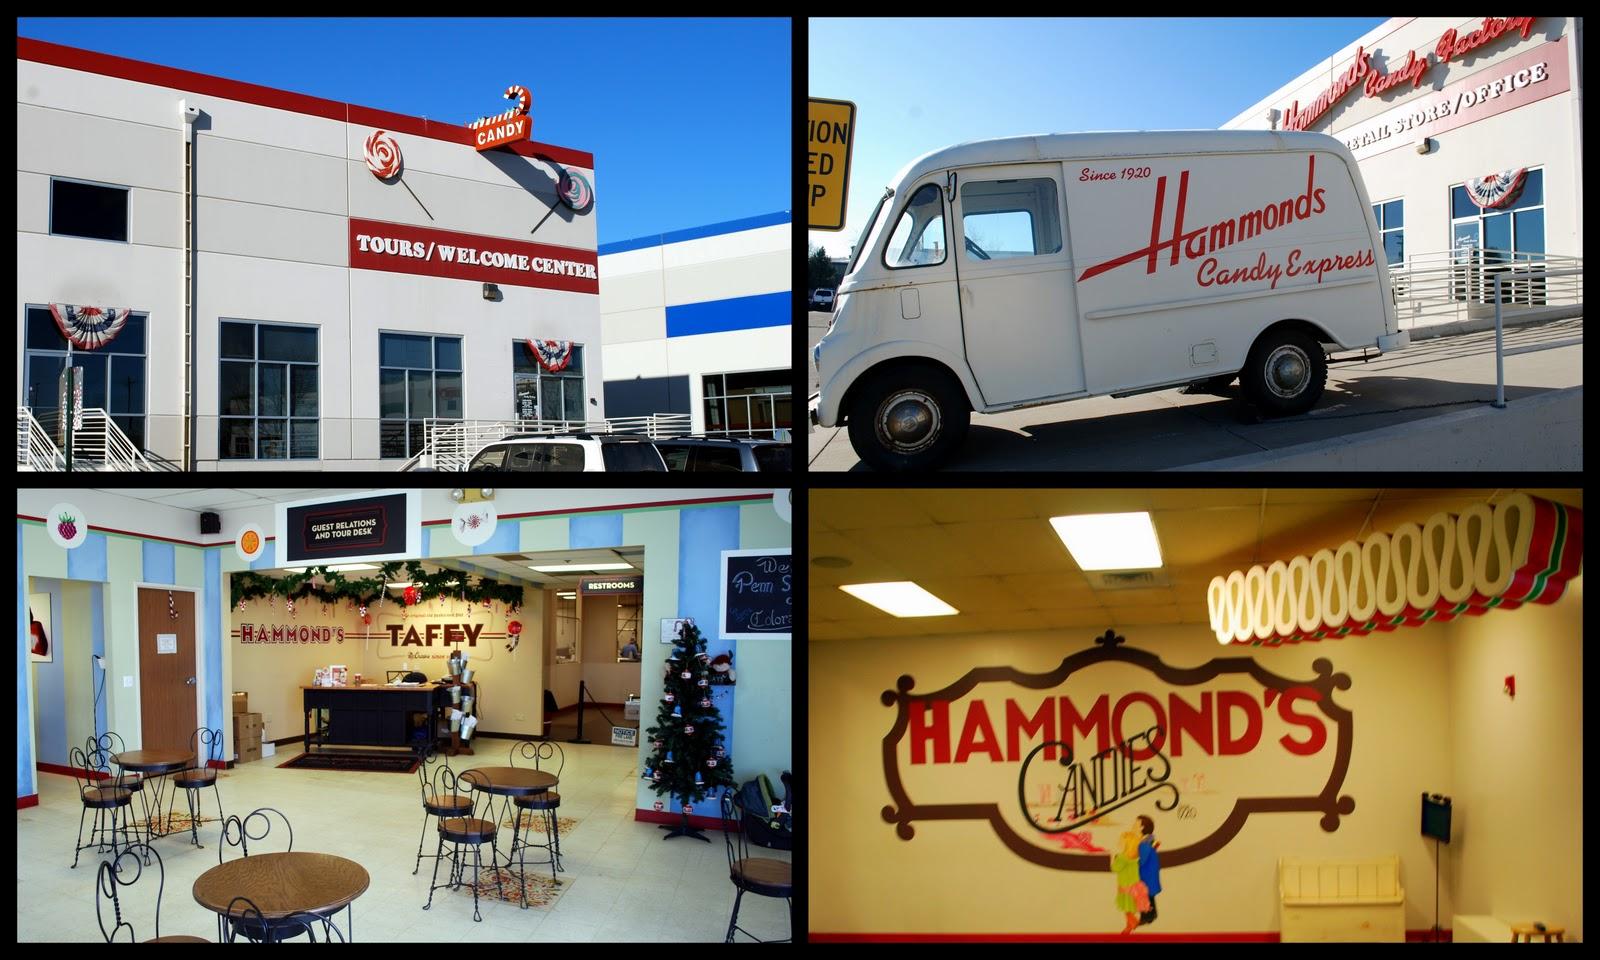 Mille Fiori Favoriti: The Hammond's Candy Factory